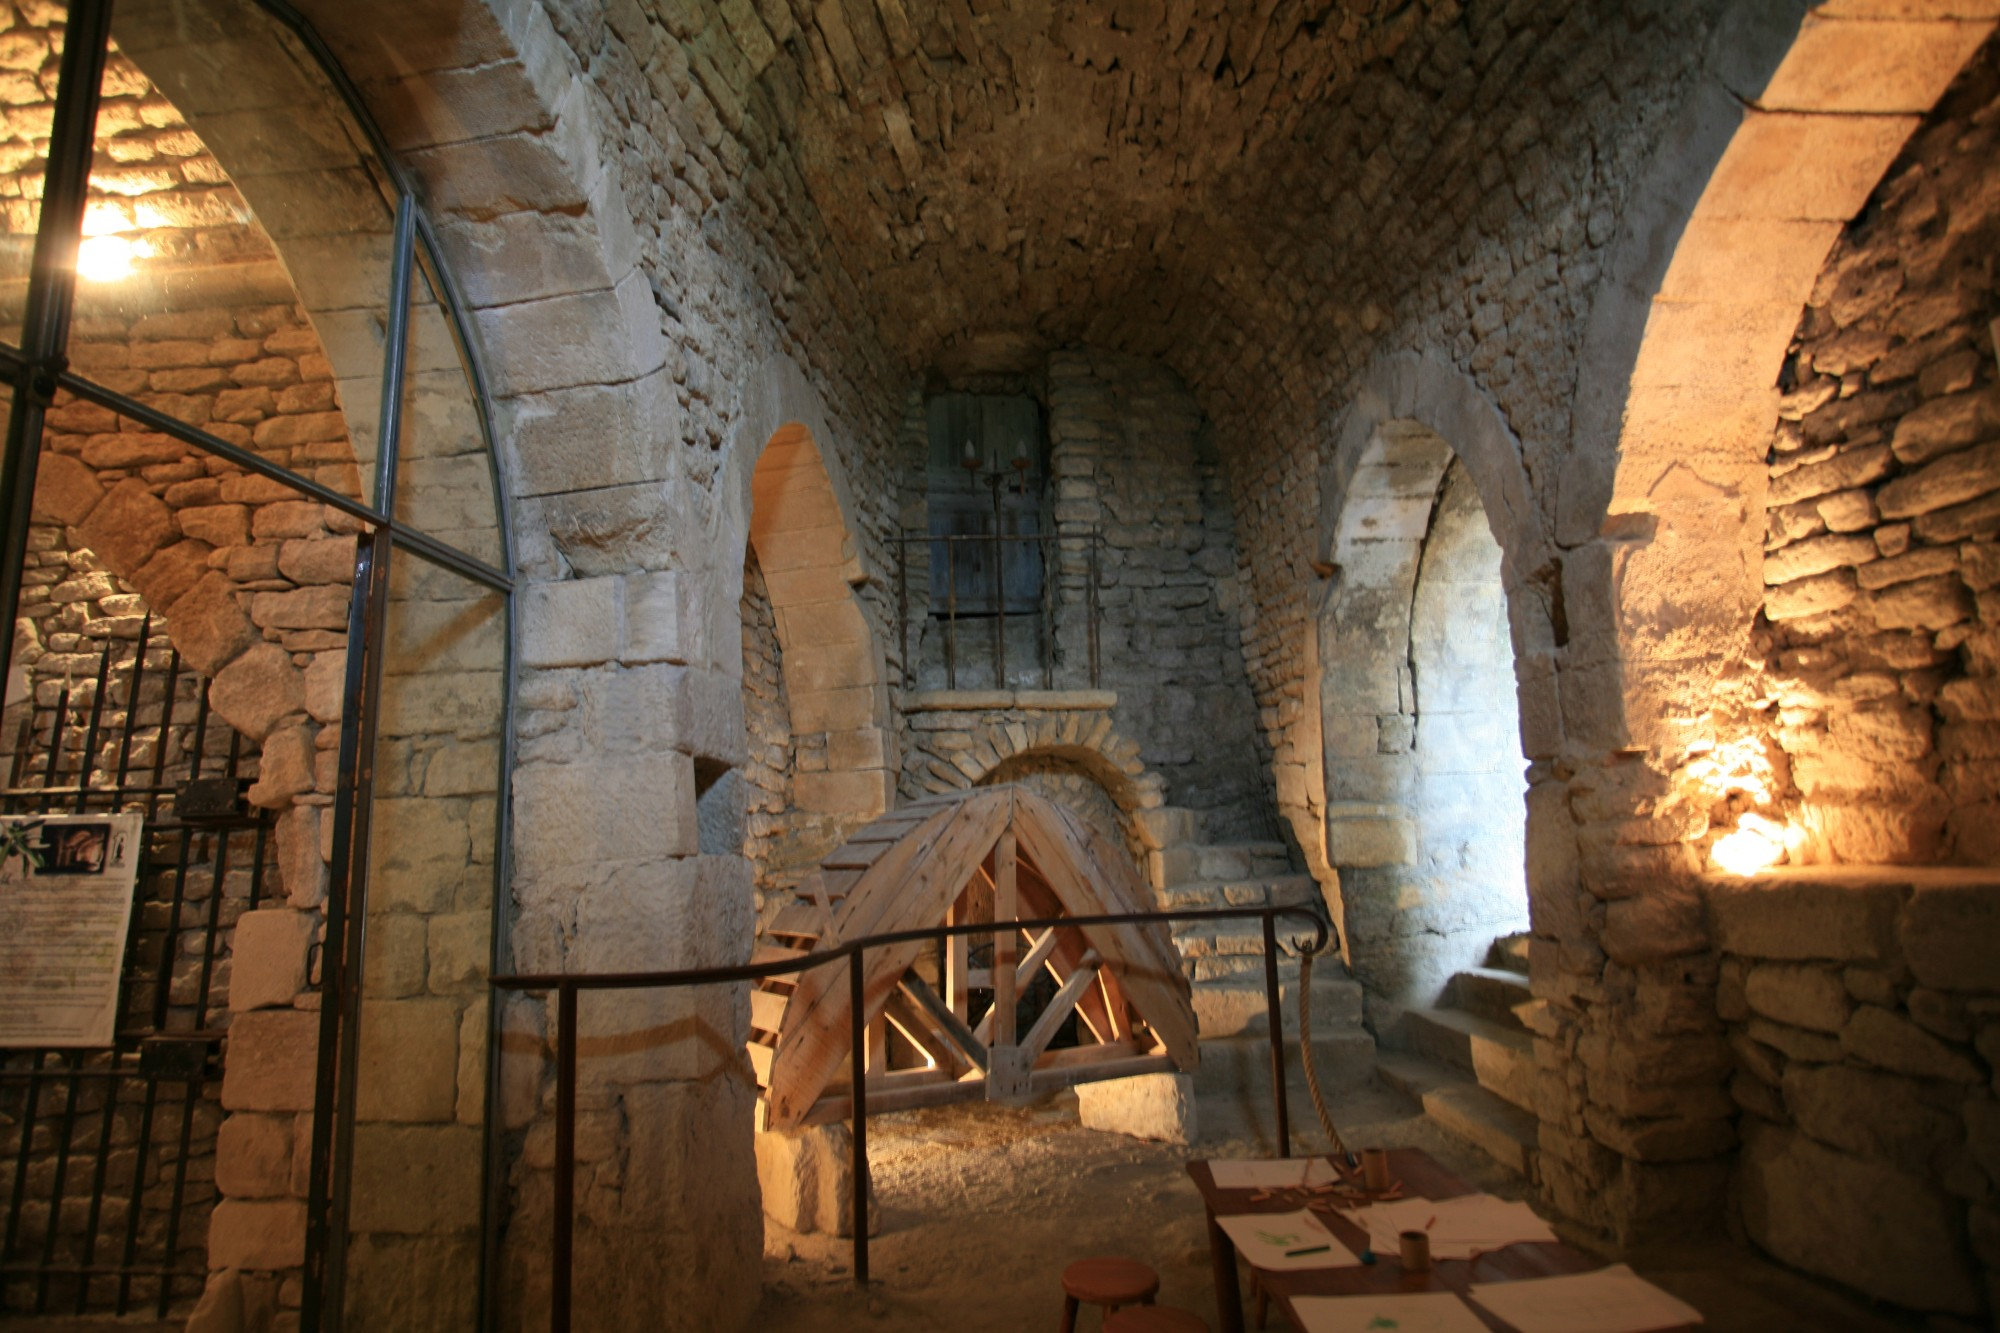 Les caves du palais saint firmin, en Luberon